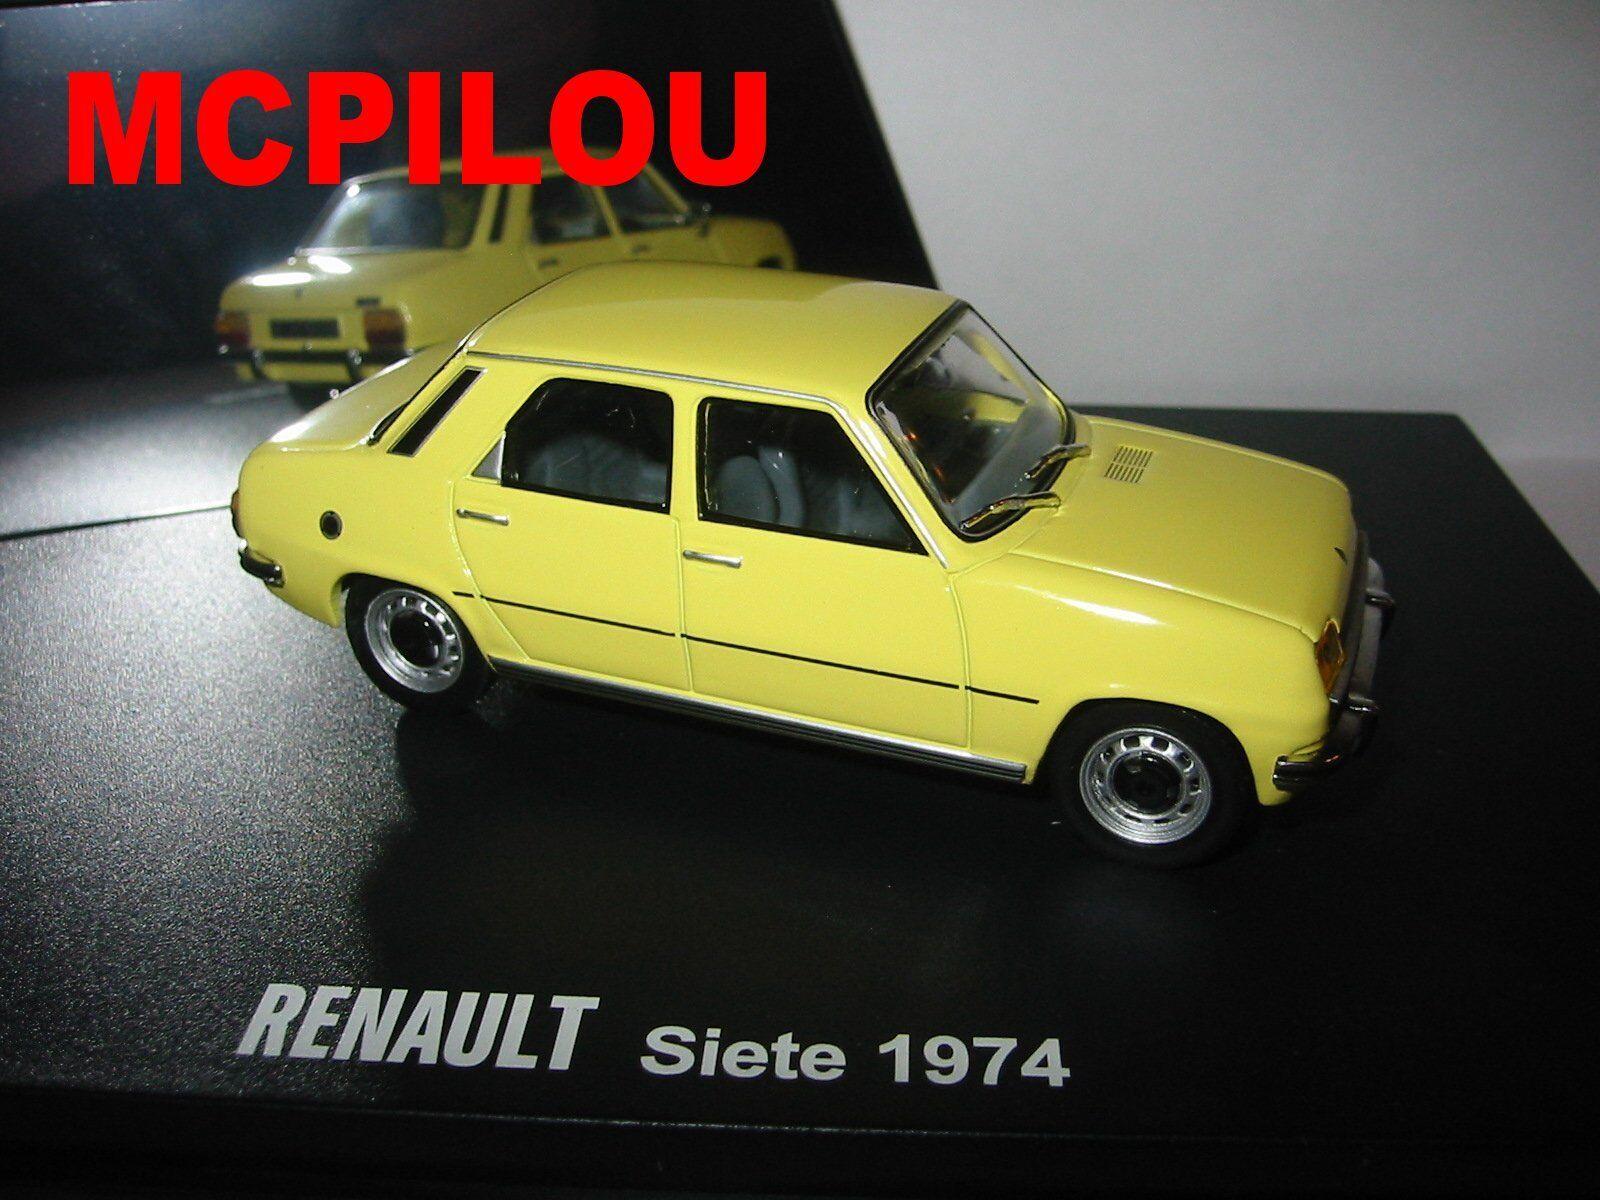 IXO RENAULT 7 SIETE yellow 1974 1974 1974 au 1 43° 667ecd